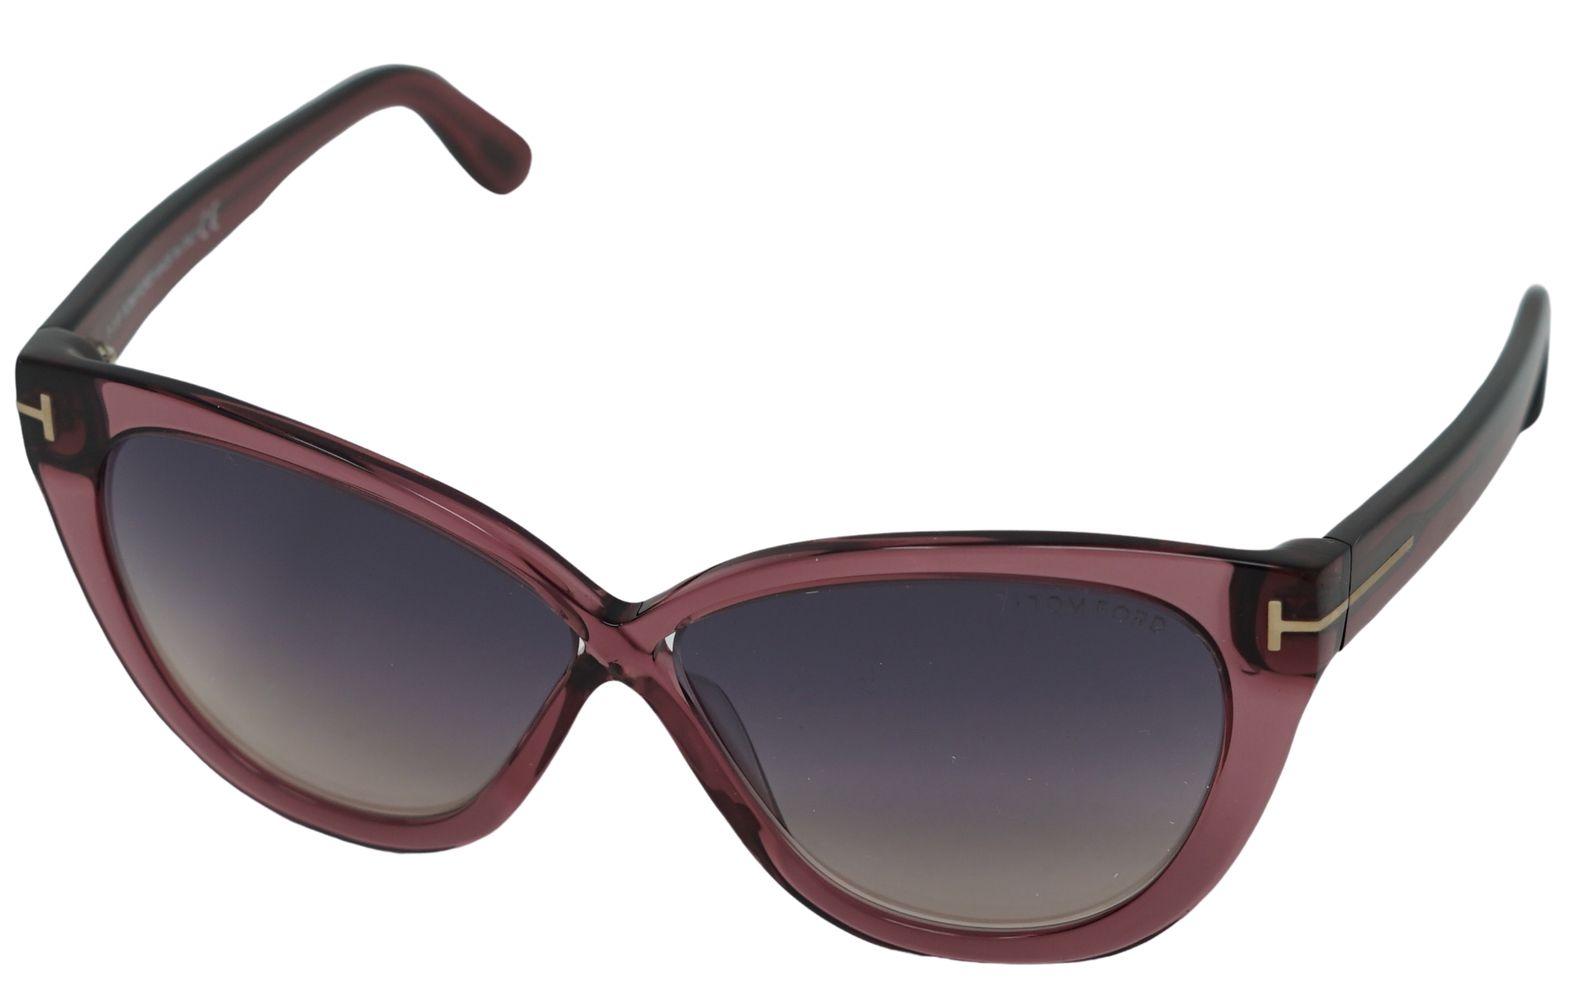 Tom Ford Arabella Sunglasses FT0511 69B